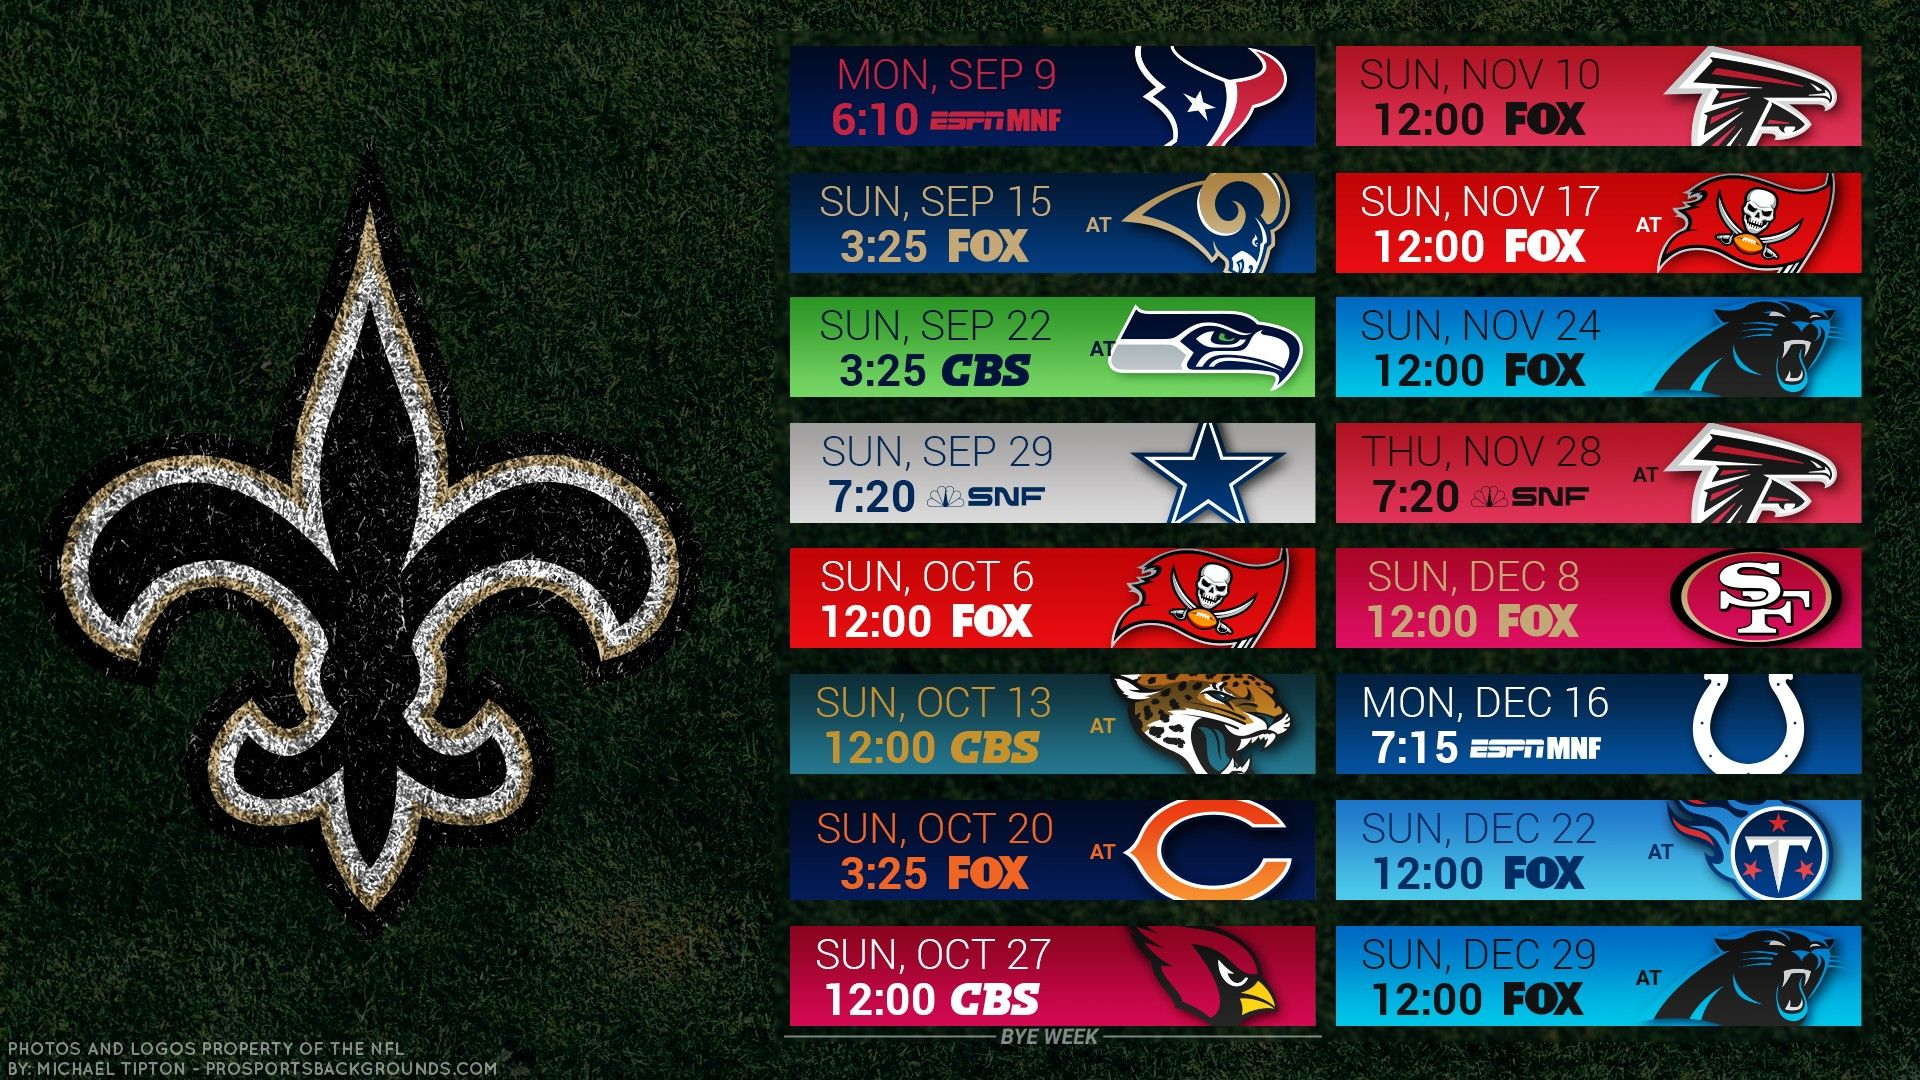 2019 New Orleans Saints Desktop Wallpaper Schedule New Orleans Saints New Orleans Saints